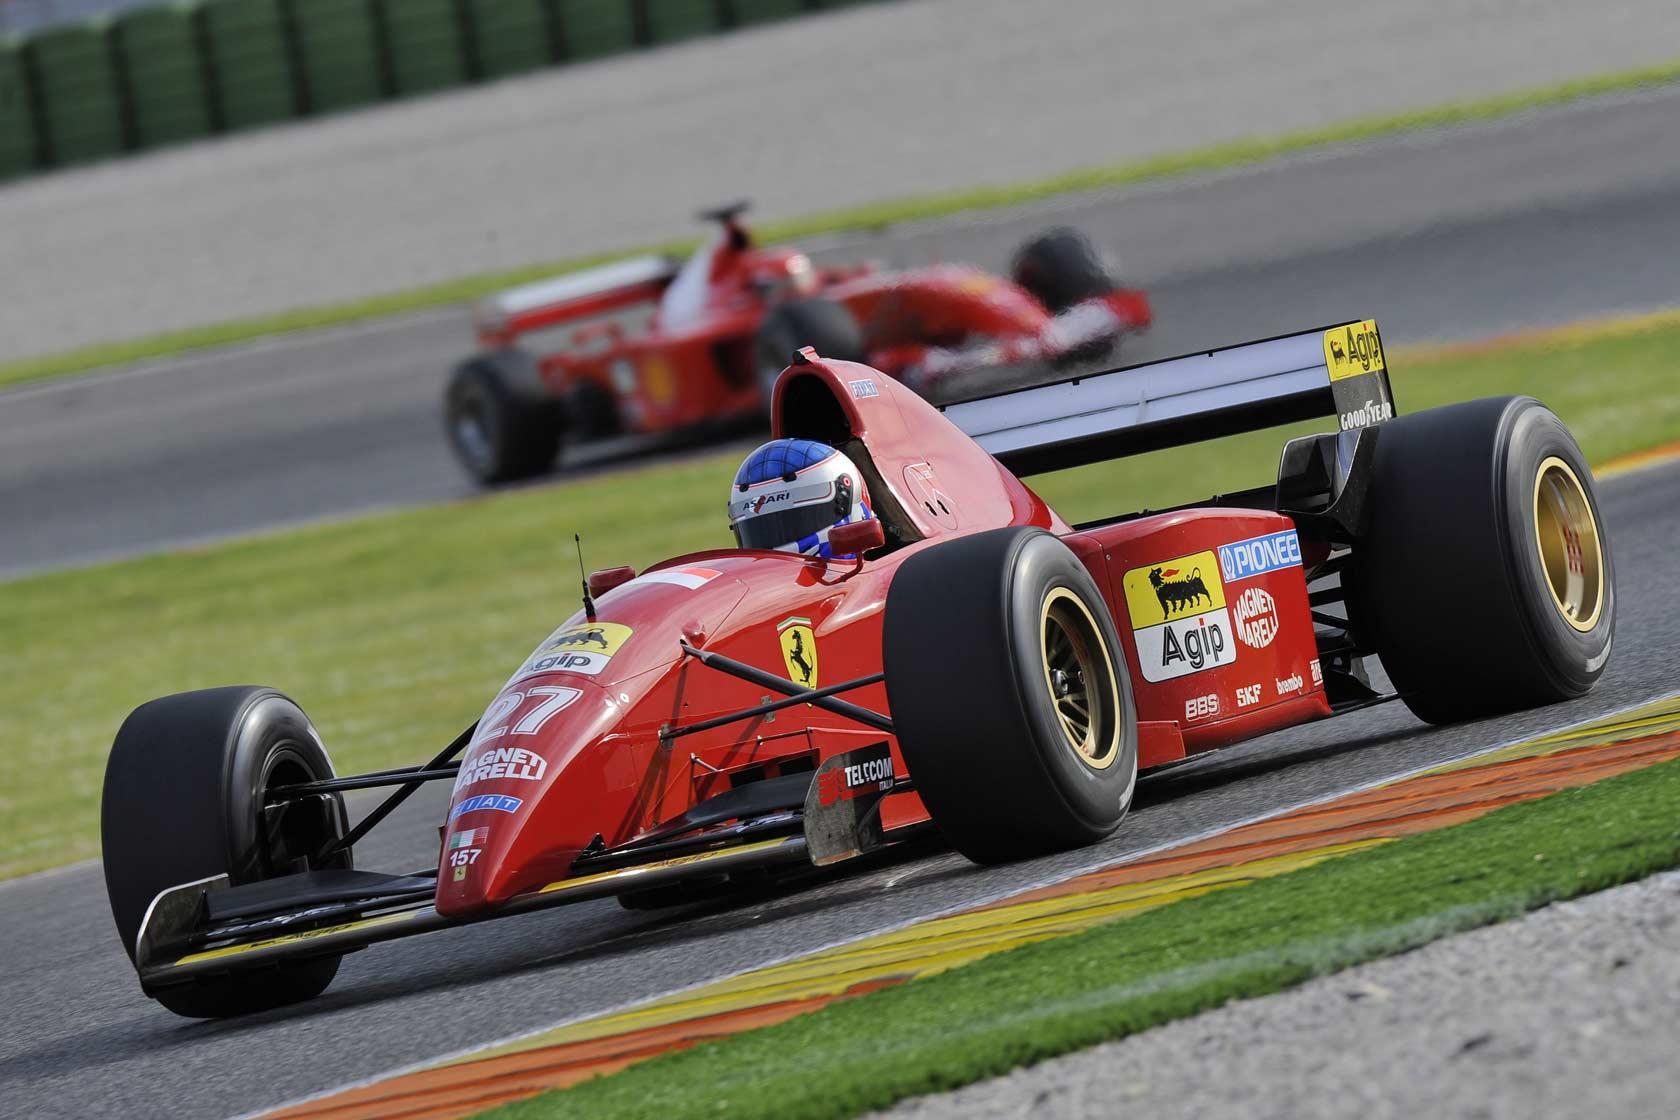 Ferrari 412 T2 F1 Acelera No Circuito De Spa Raz 227 O Autom 243 Vel